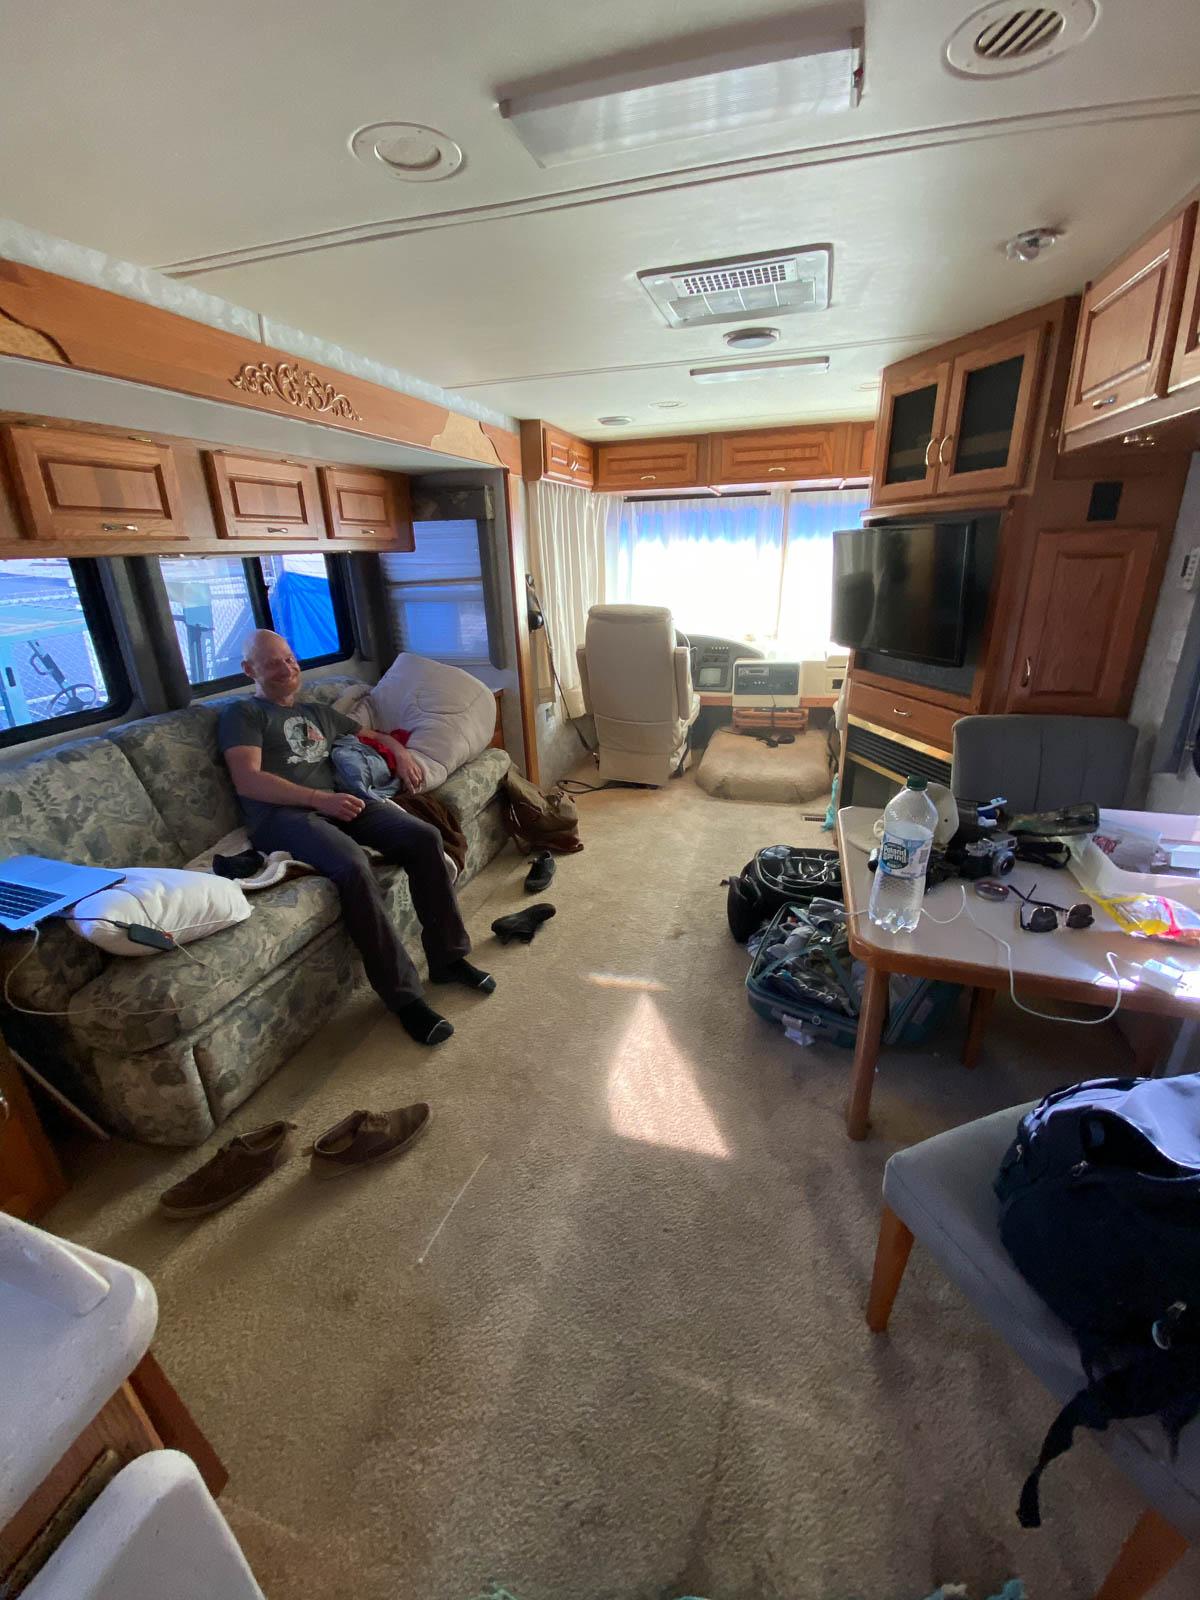 Camper life, not so bad